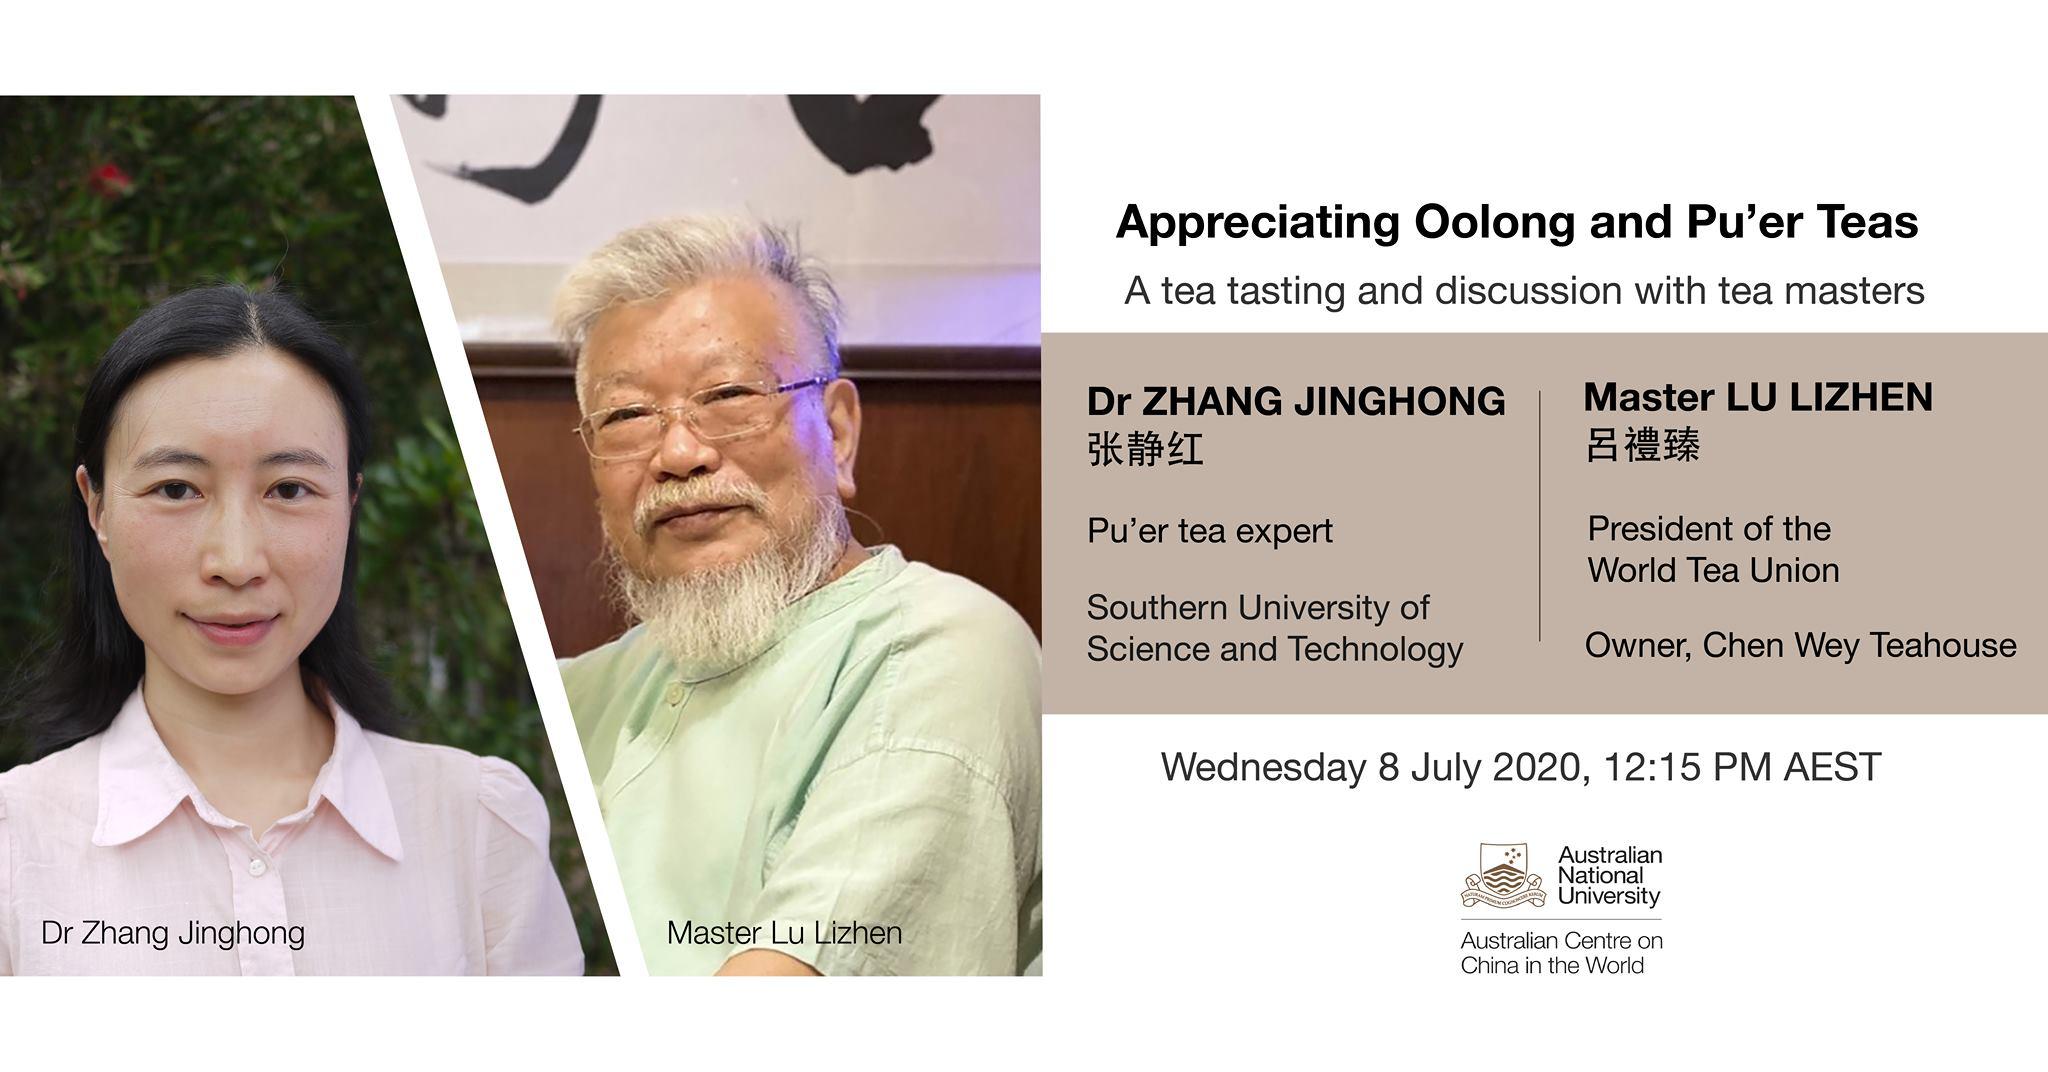 Appreciating Oolong and Pu'er Teas